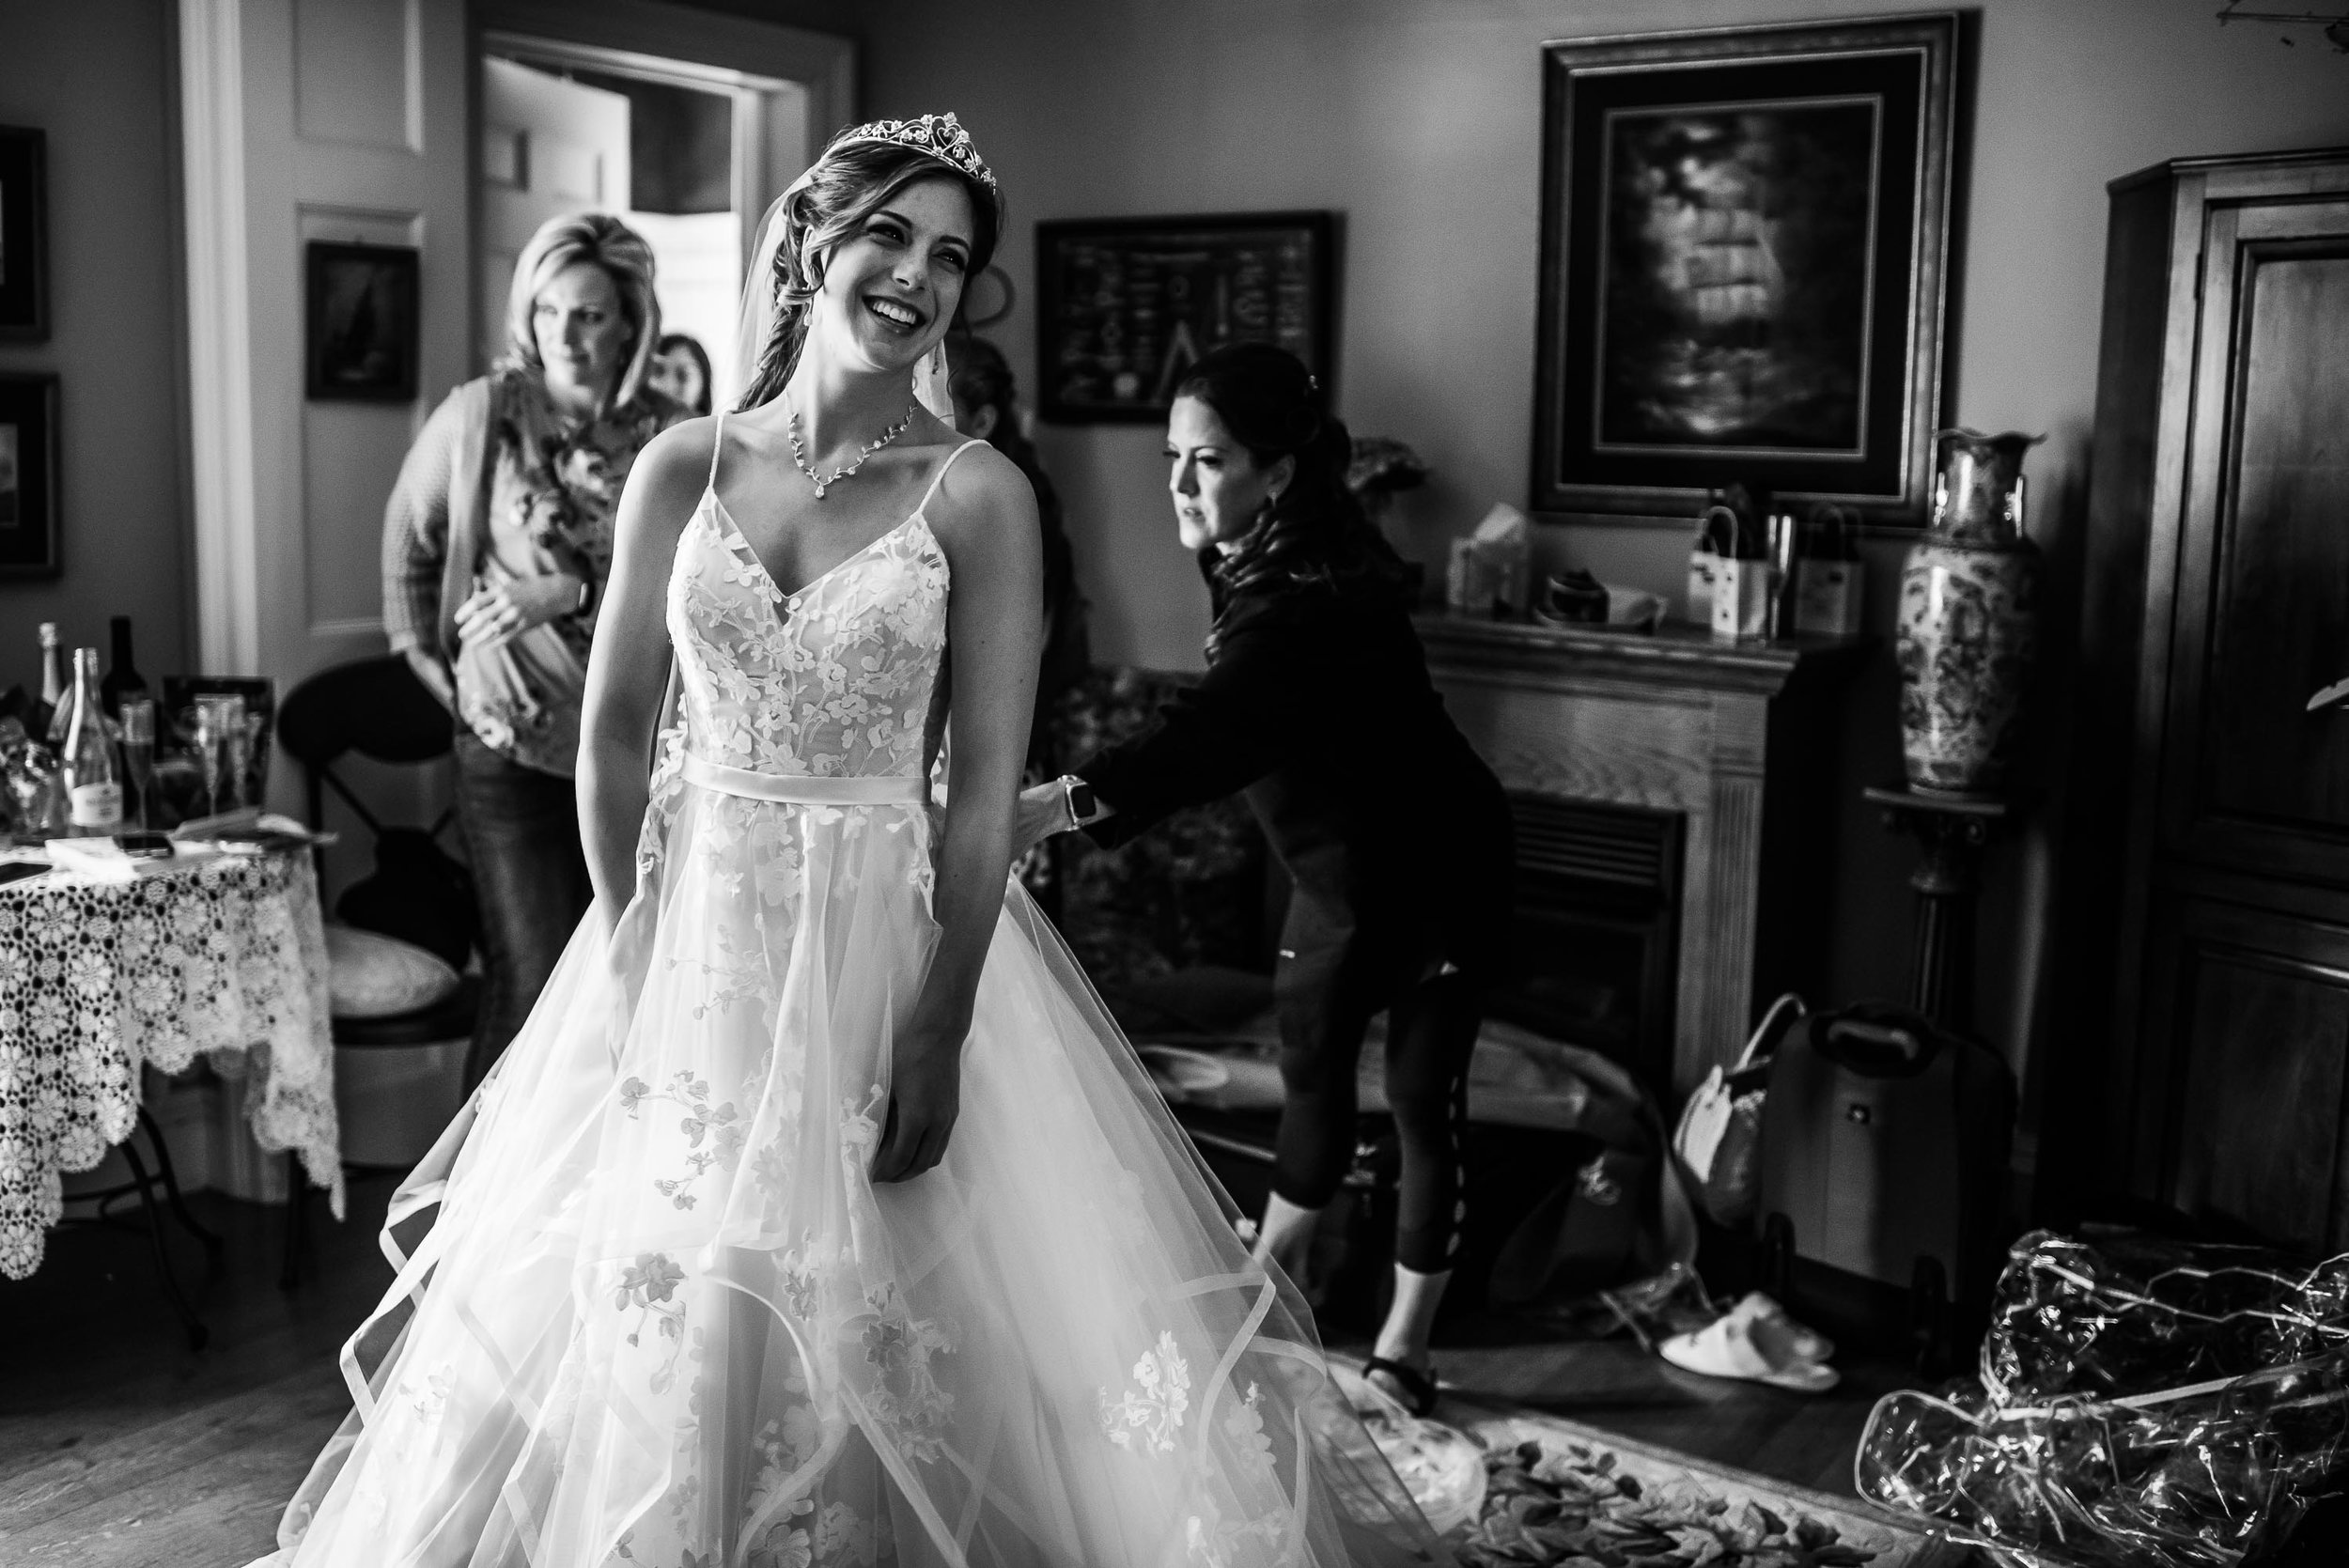 thornewood castle wedding 8.jpg